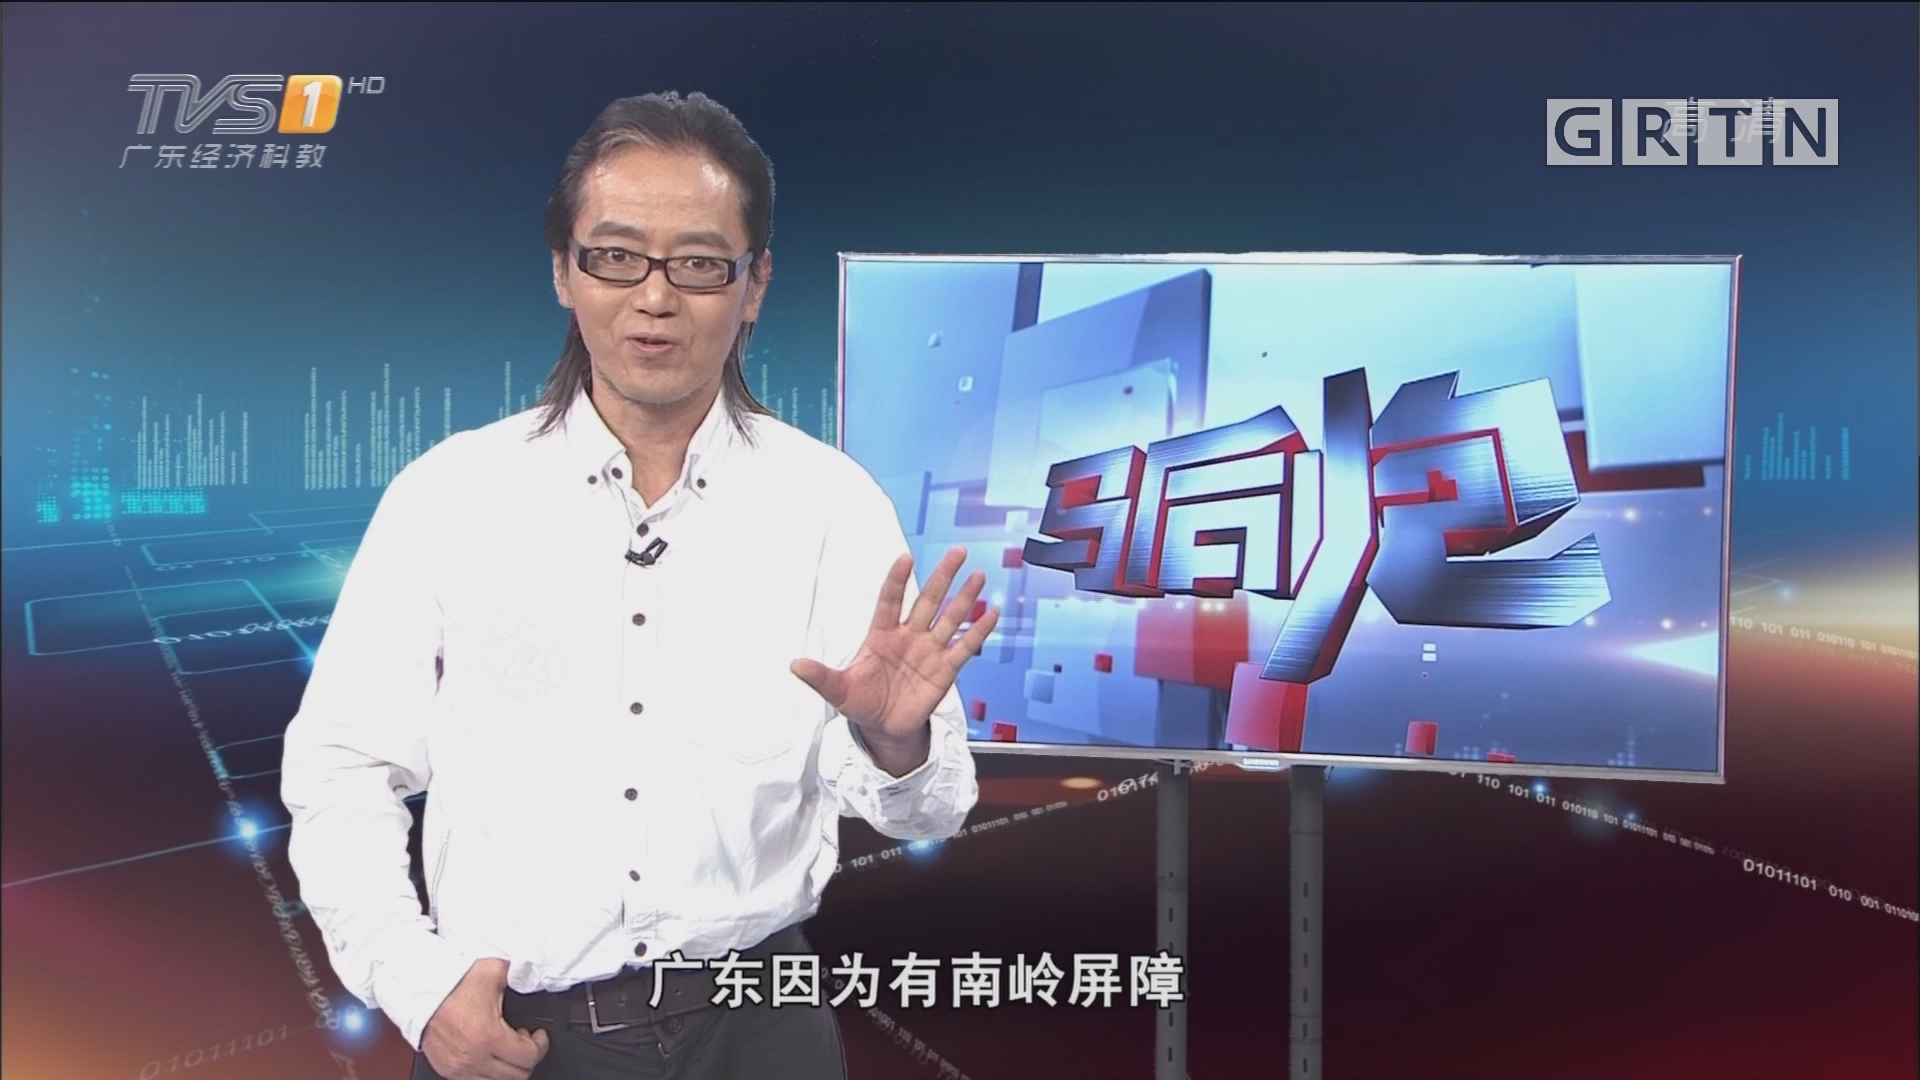 [HD][2017-11-09]马后炮:饮鸩止渴的暴力 戒网瘾模式当彻底否定